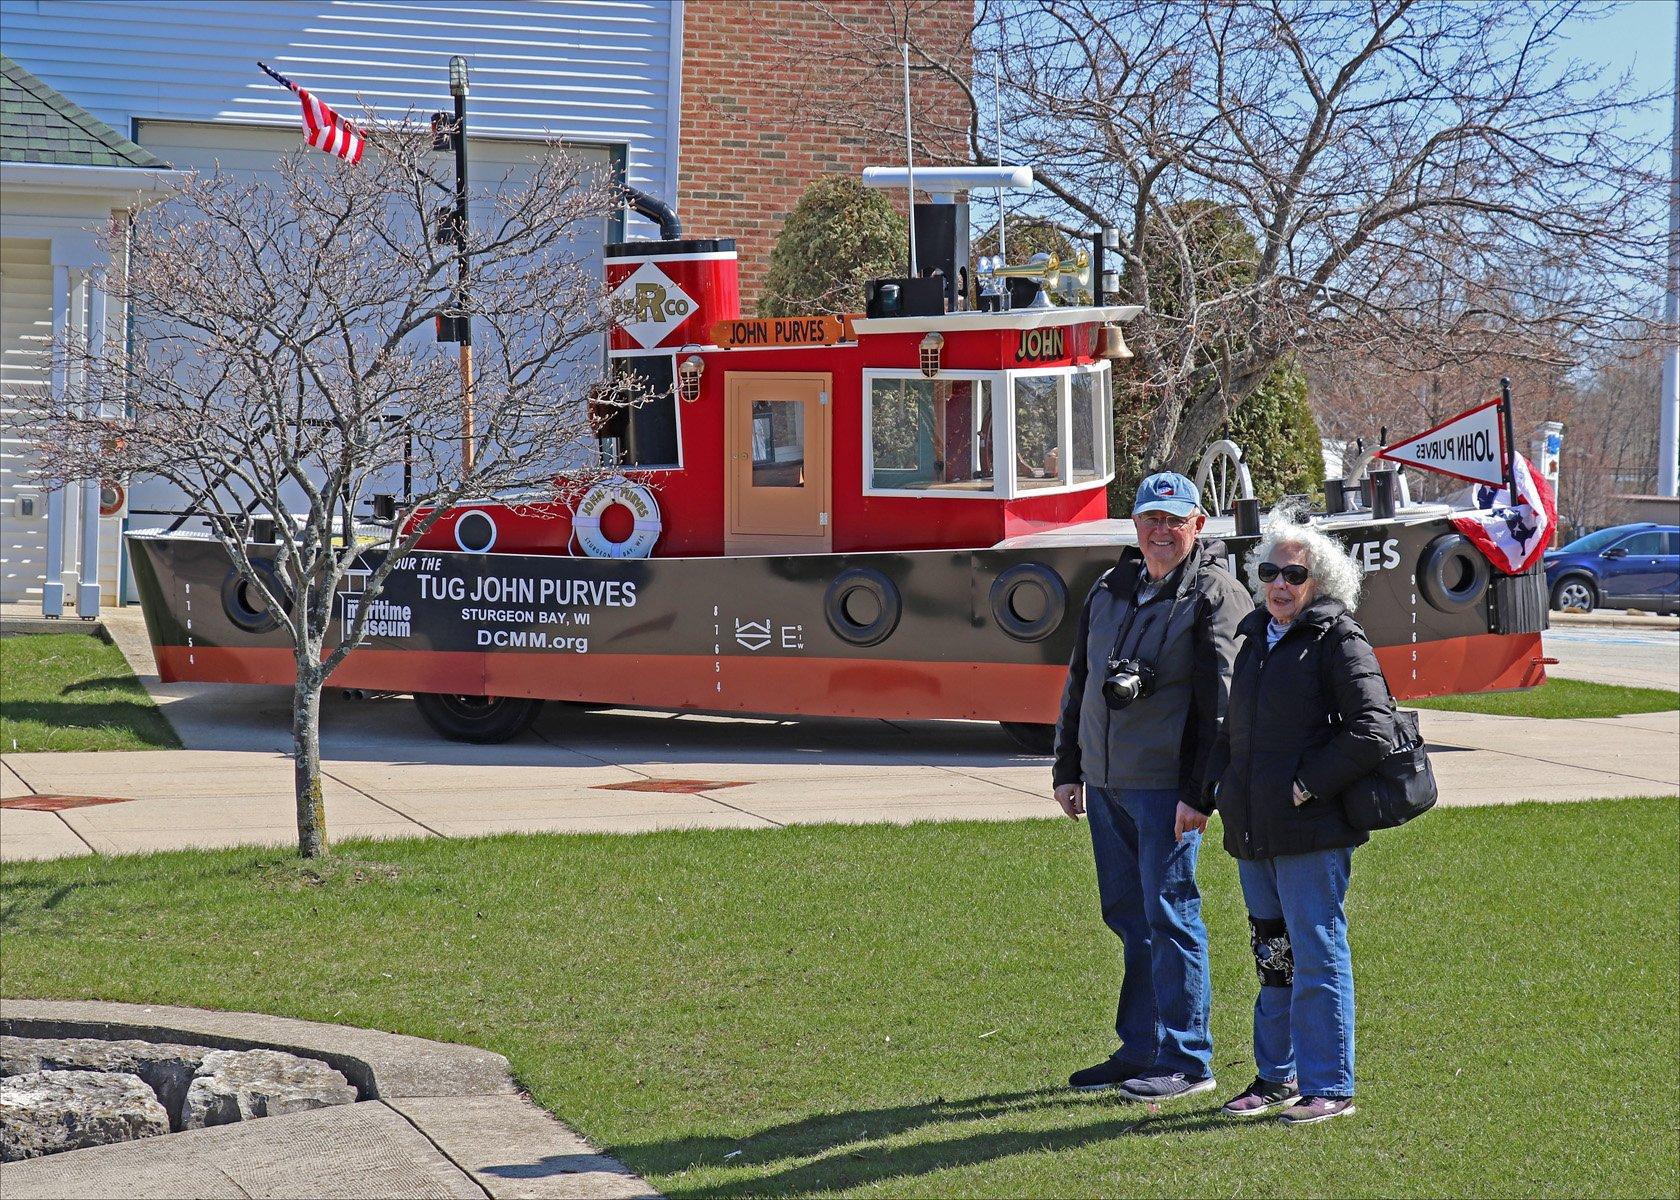 Photo friends Howard Vrankin and Linda Lee at the Door County Maritime Museum